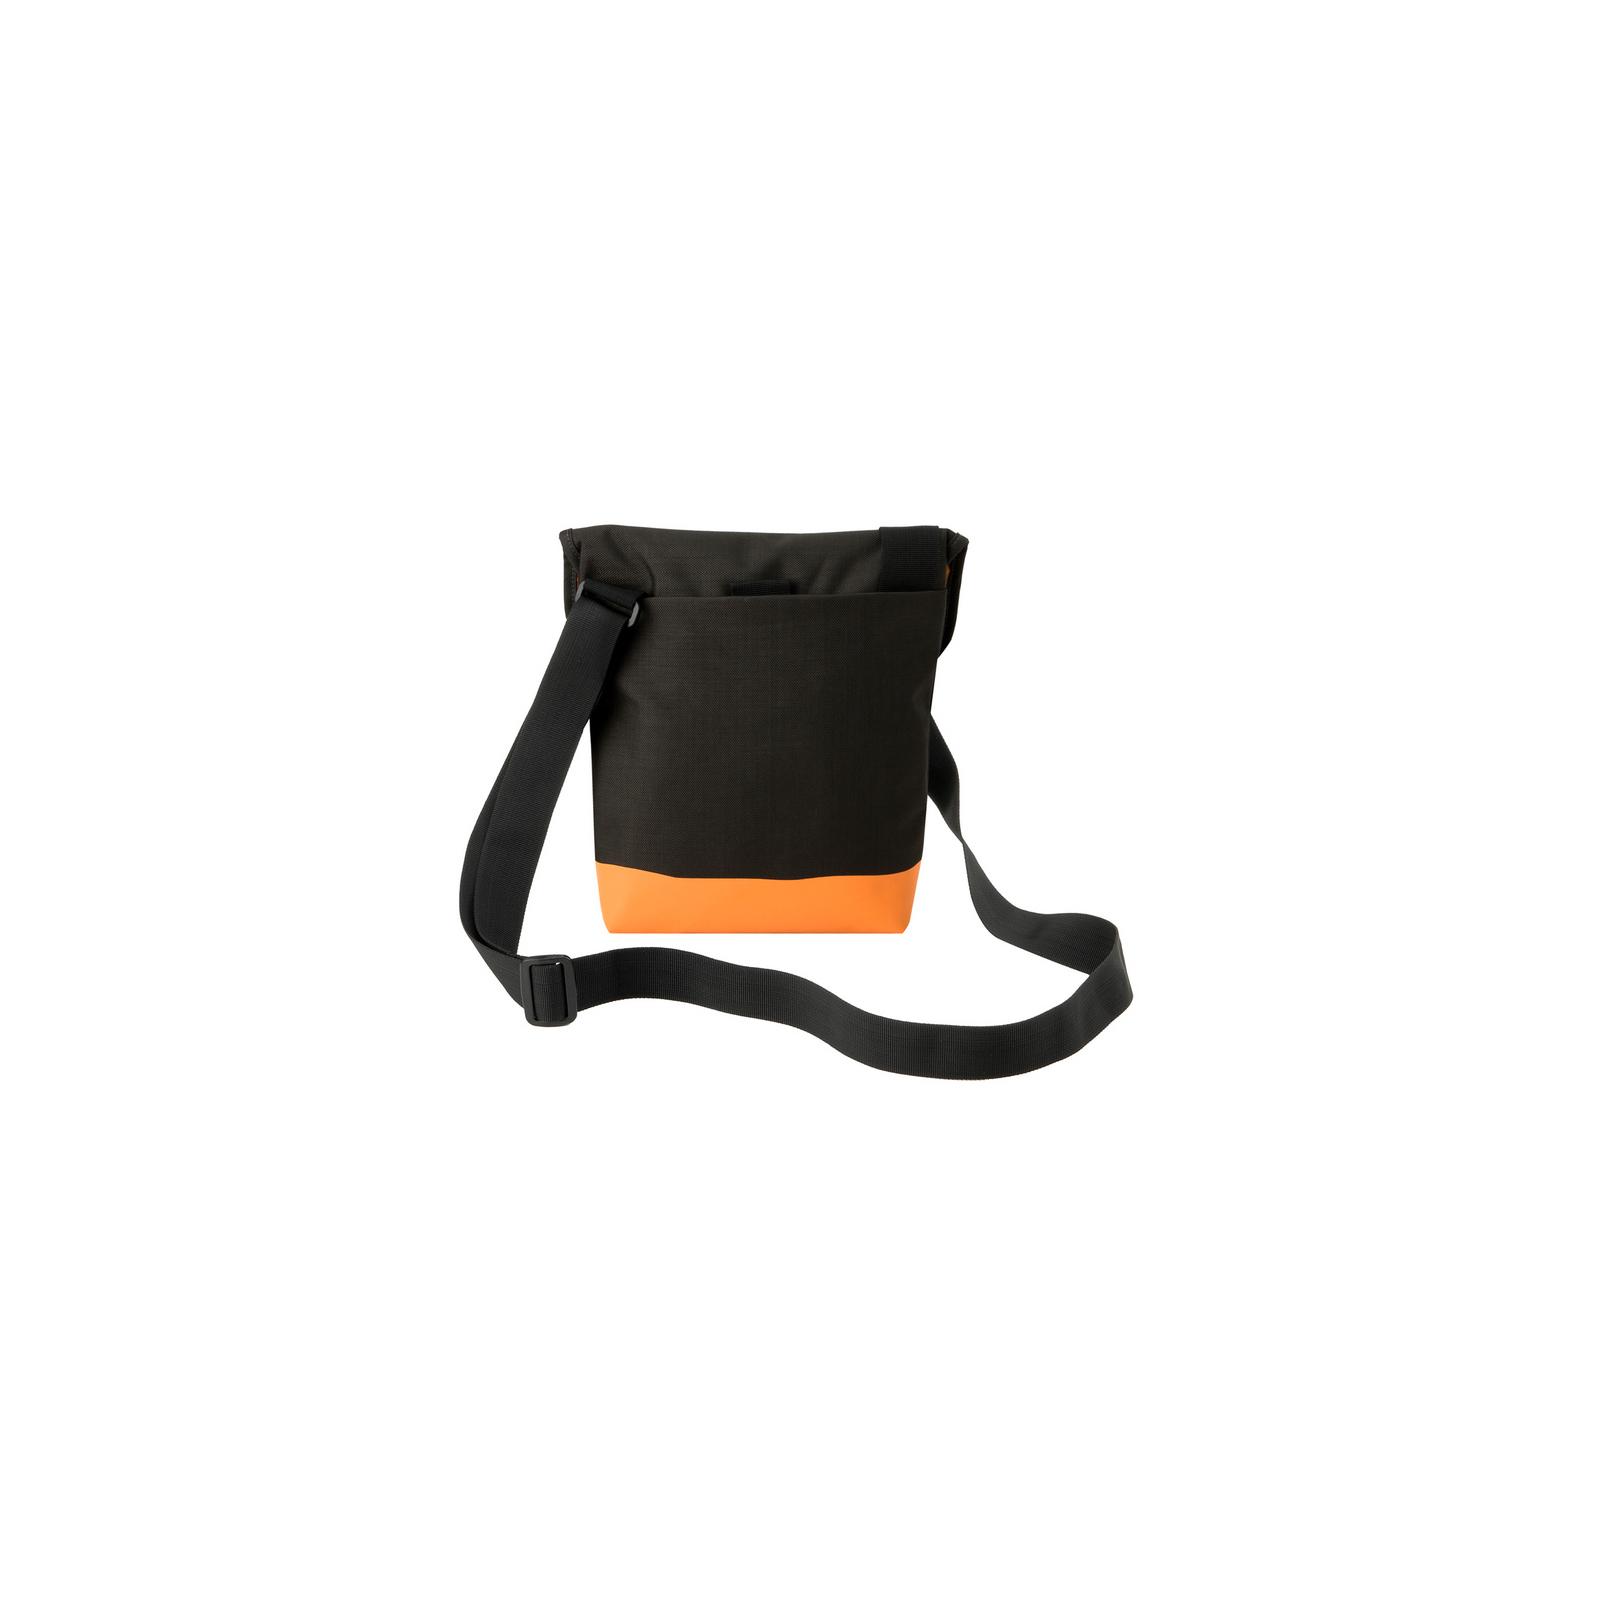 Чехол для планшета Crumpler 9 Private Surprise Sling S /charcoal - orange (PSS-S-004) изображение 3